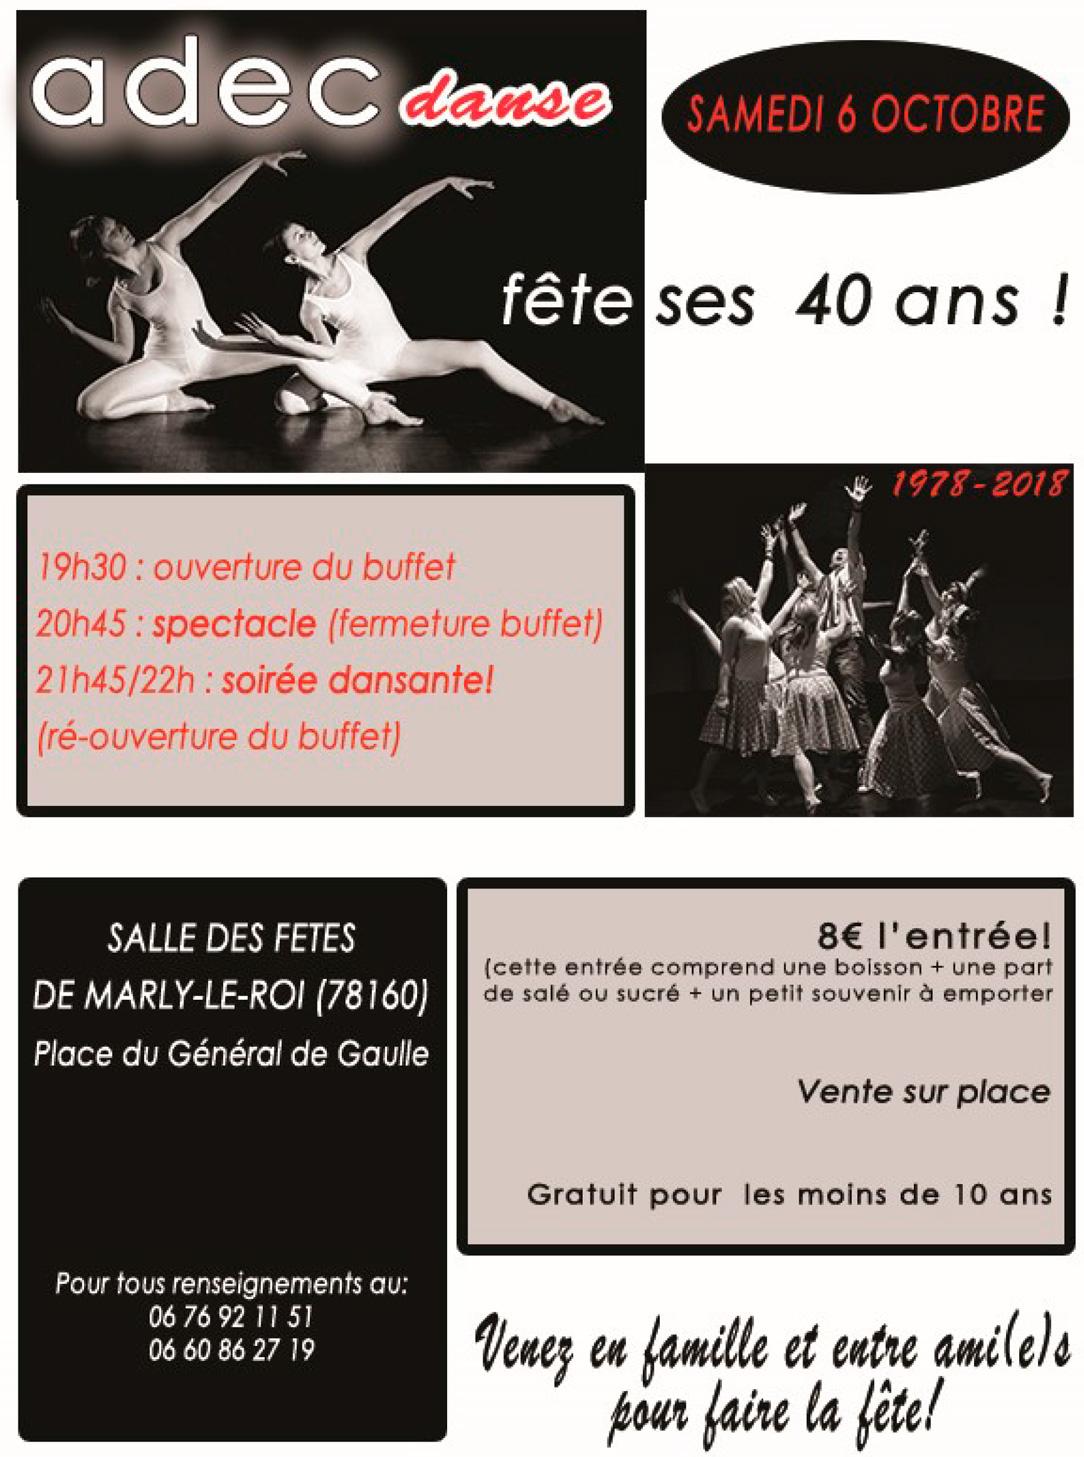 ADEC danse fête ses 40 ans samedi 6 octobre